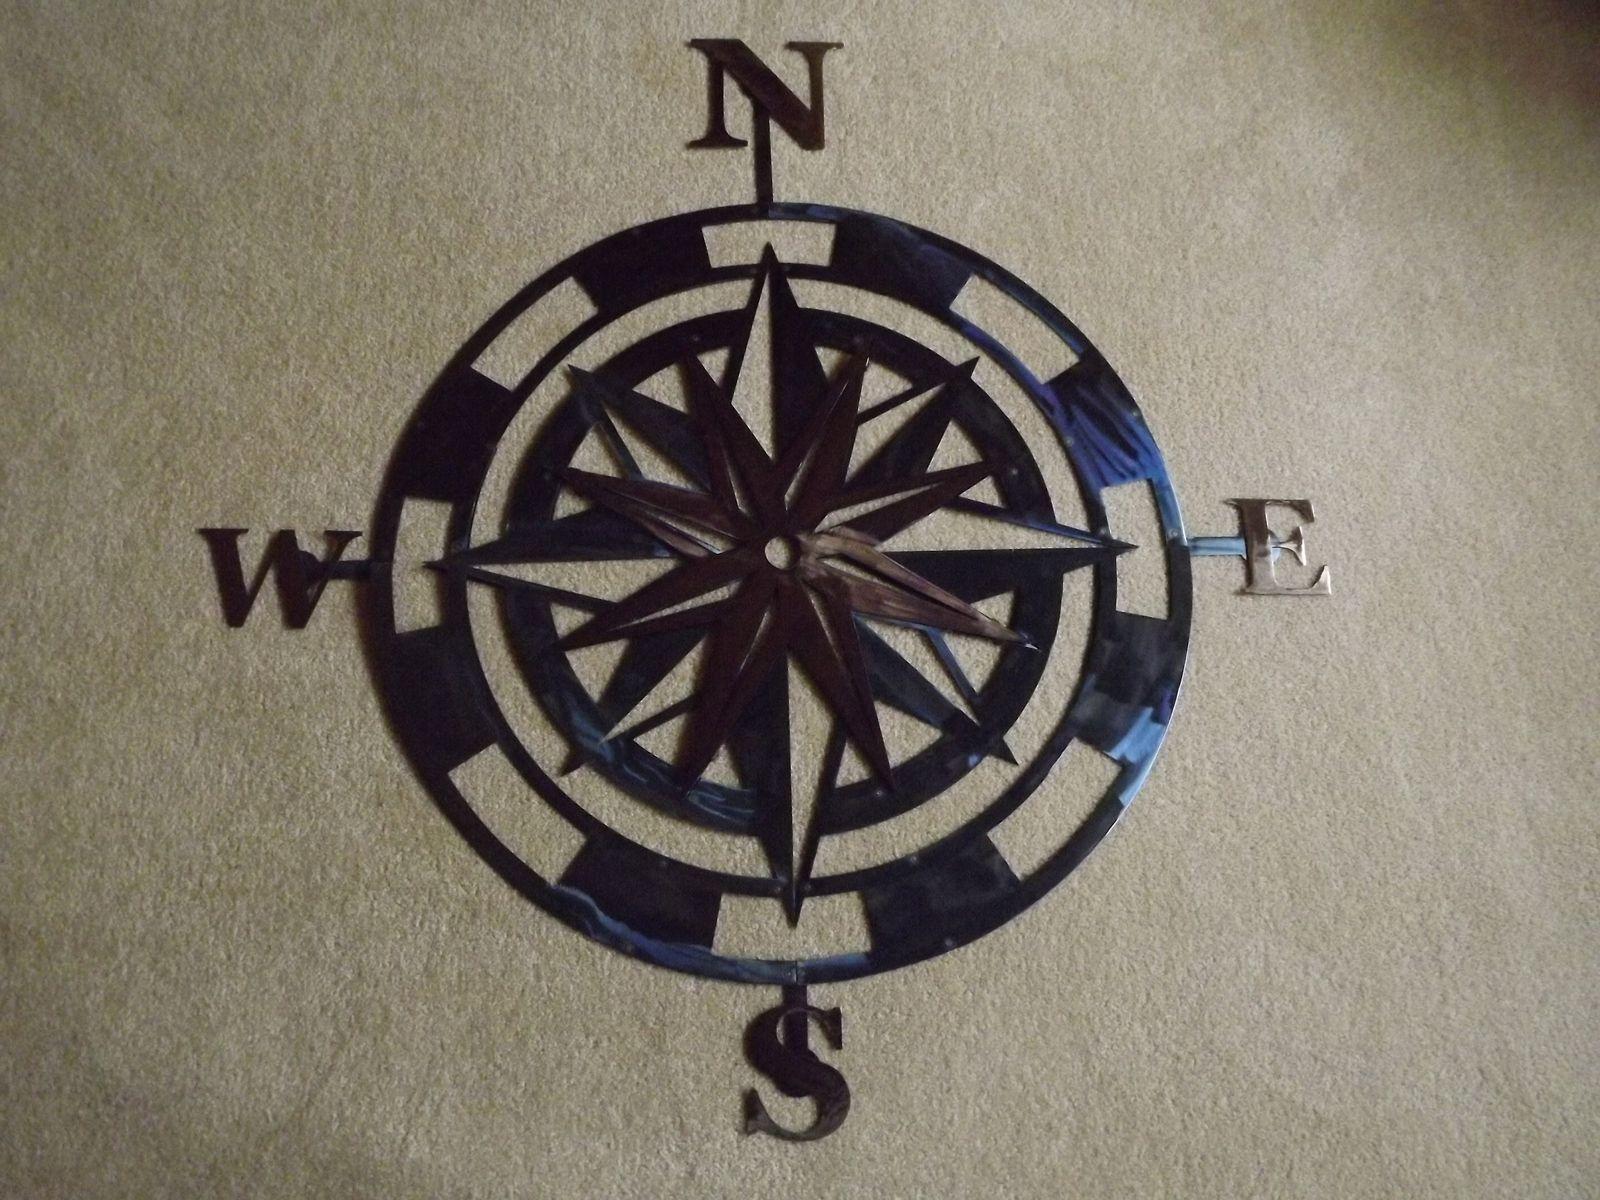 Outdoor Metal Wall Compass Regarding Recent Handmade 36 Inch Metal Compass Rose Wall Artsuperior Iron Artz (Gallery 14 of 20)